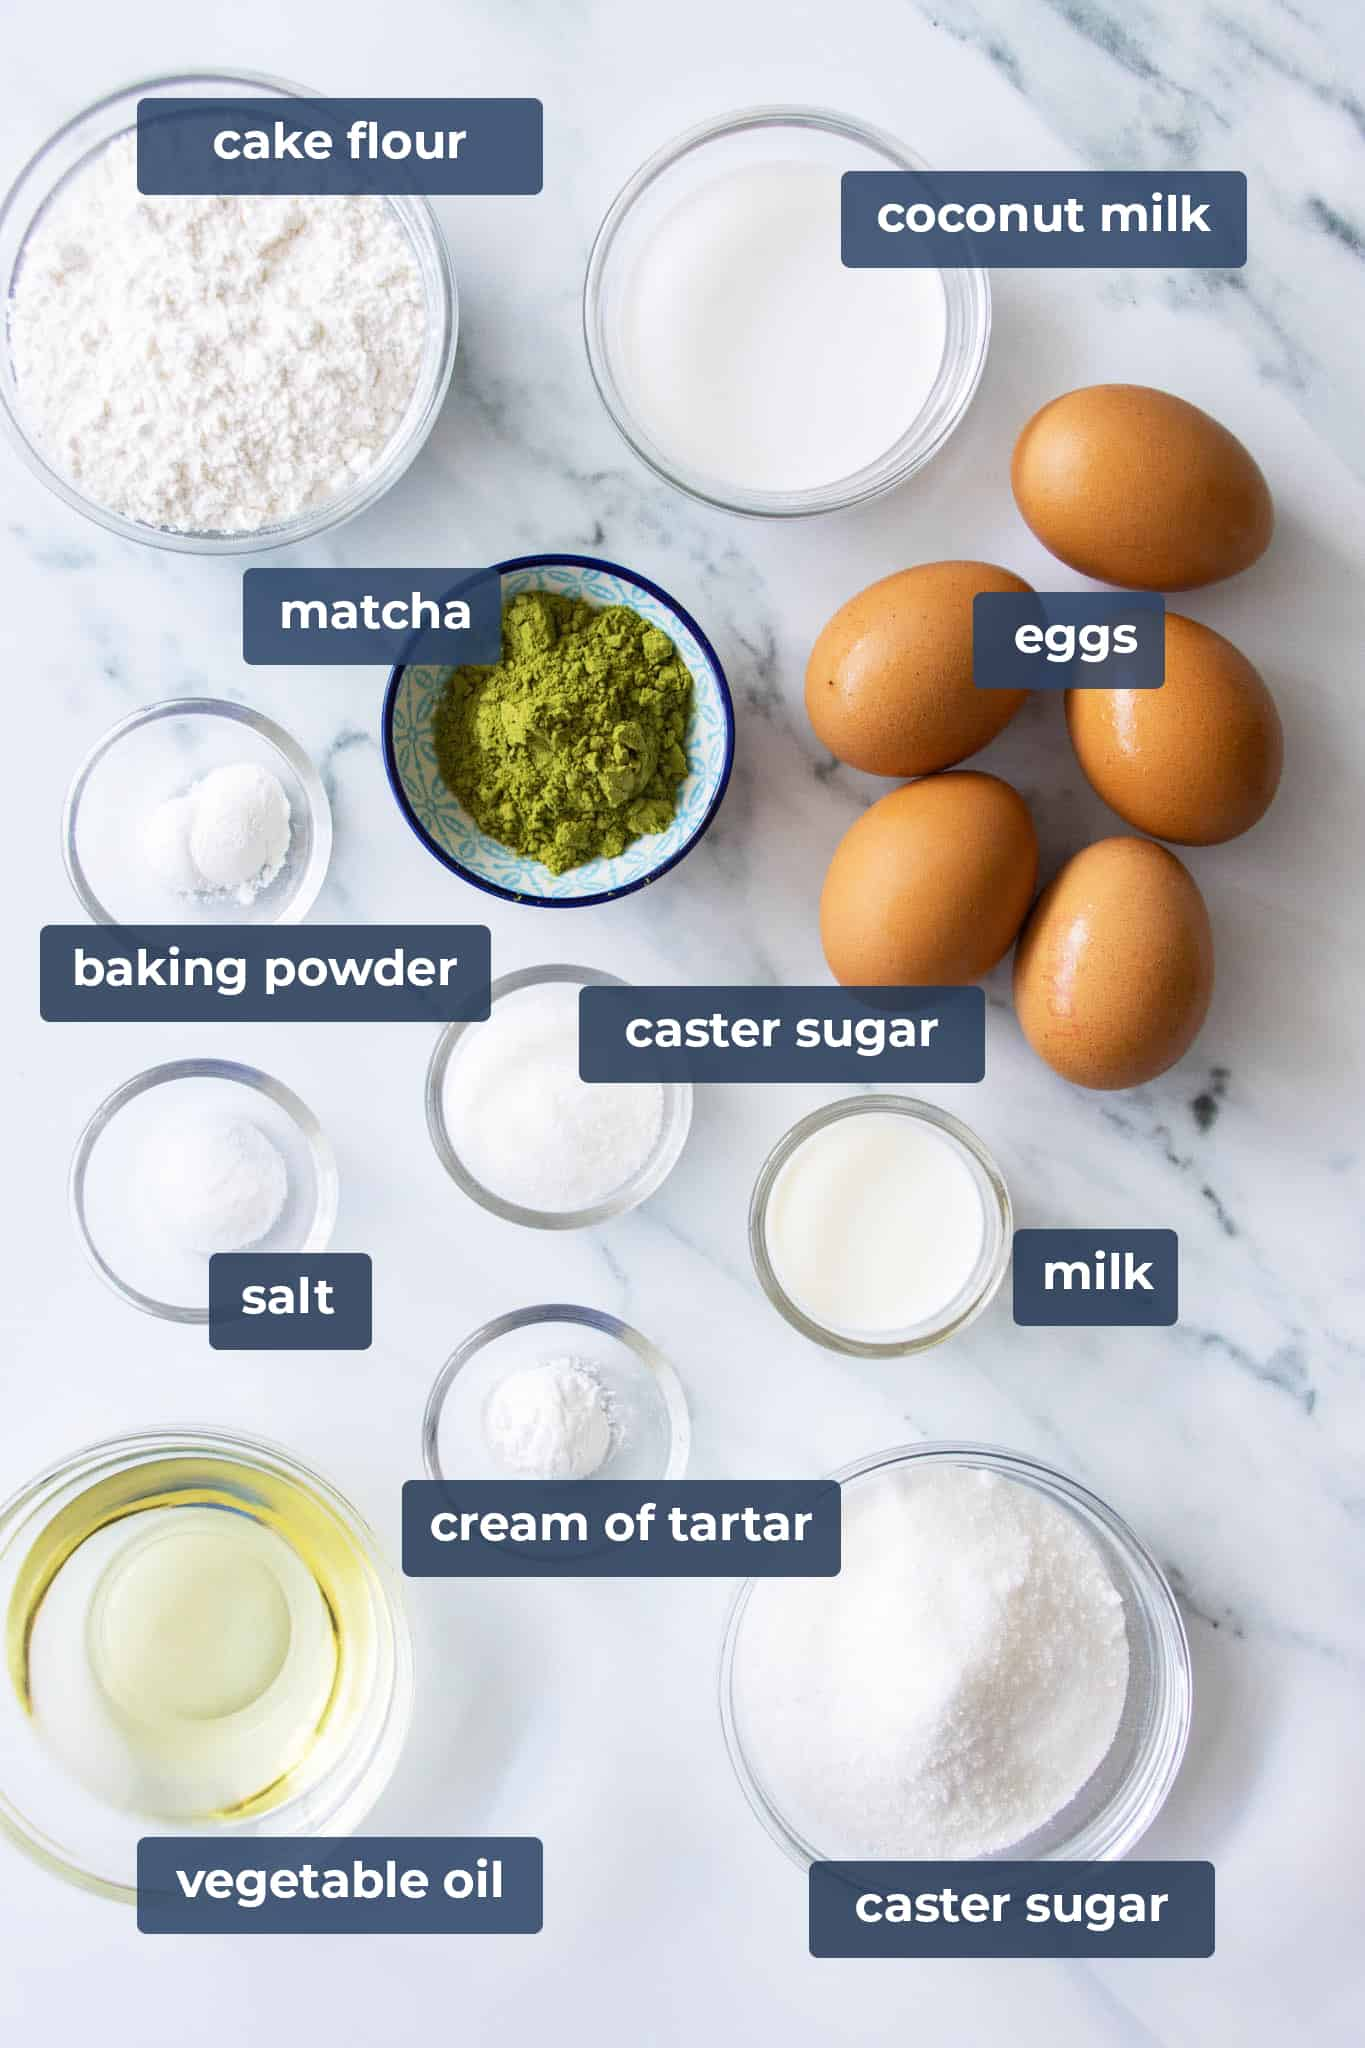 ingredients for matcha (green tea) chiffon cake